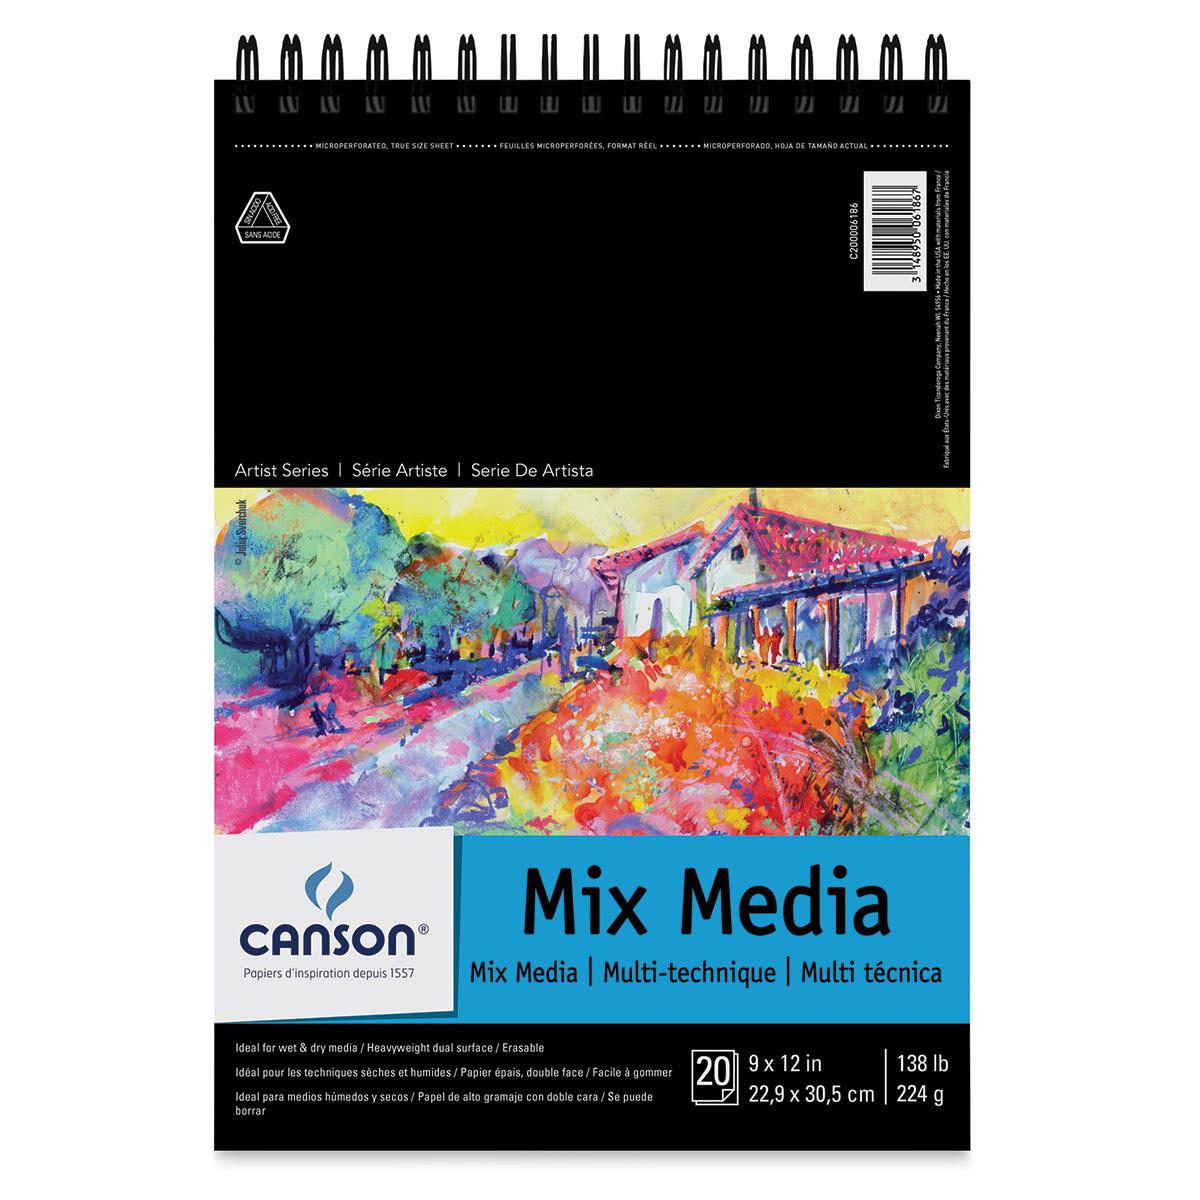 Mix Media 22,9/x 30,5/cm Canson Plein AIR Art Board Pad